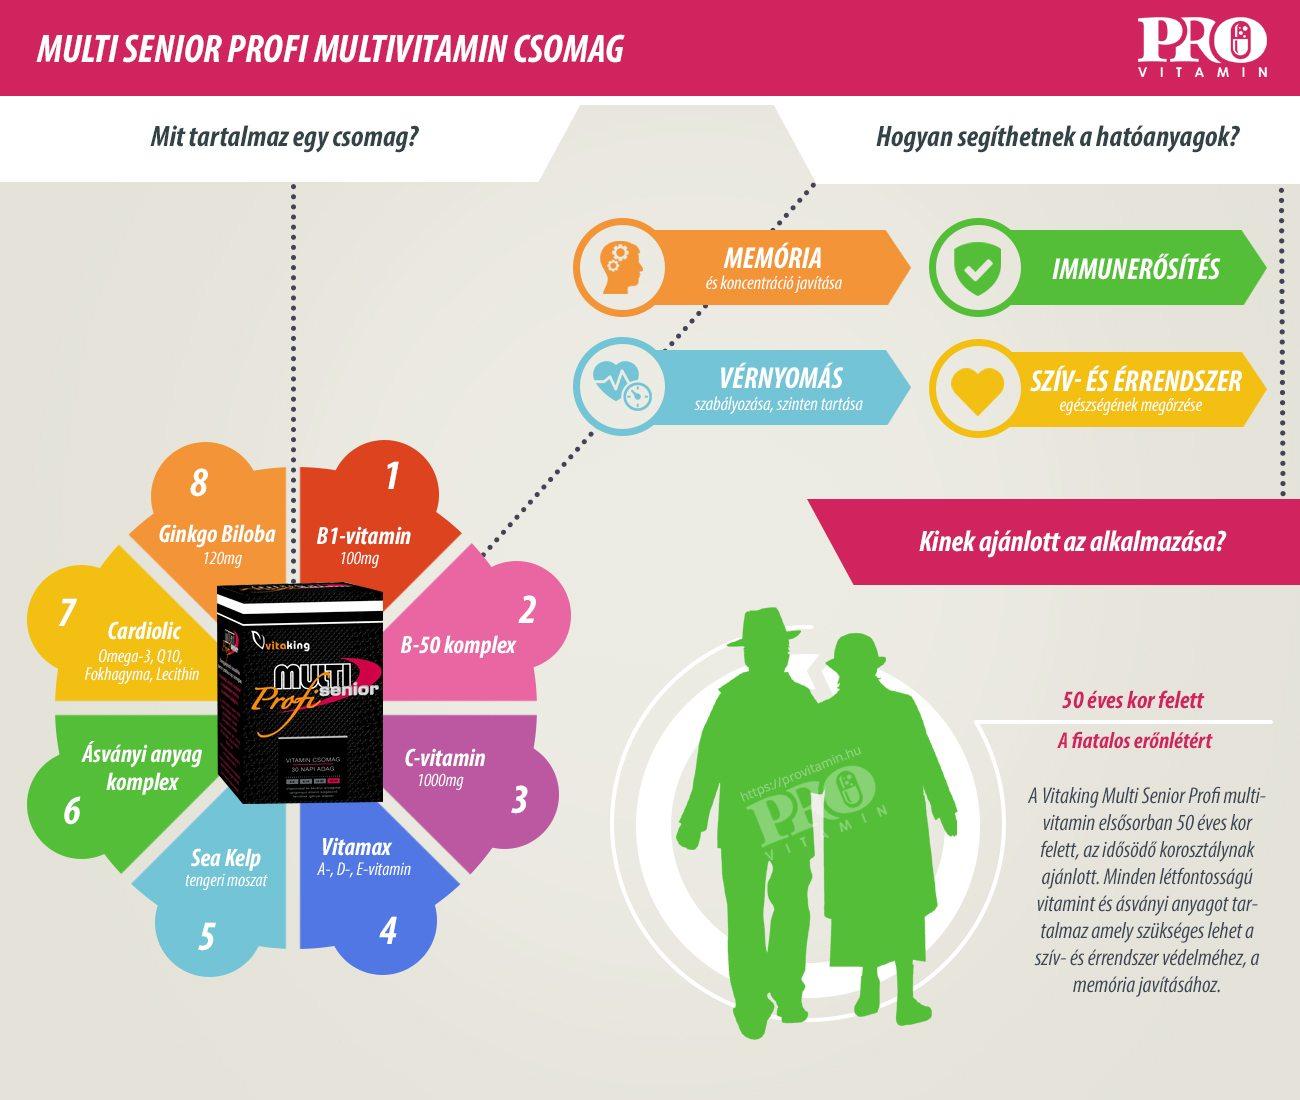 Vitaking Multi Senior Profi termékismertető infografika